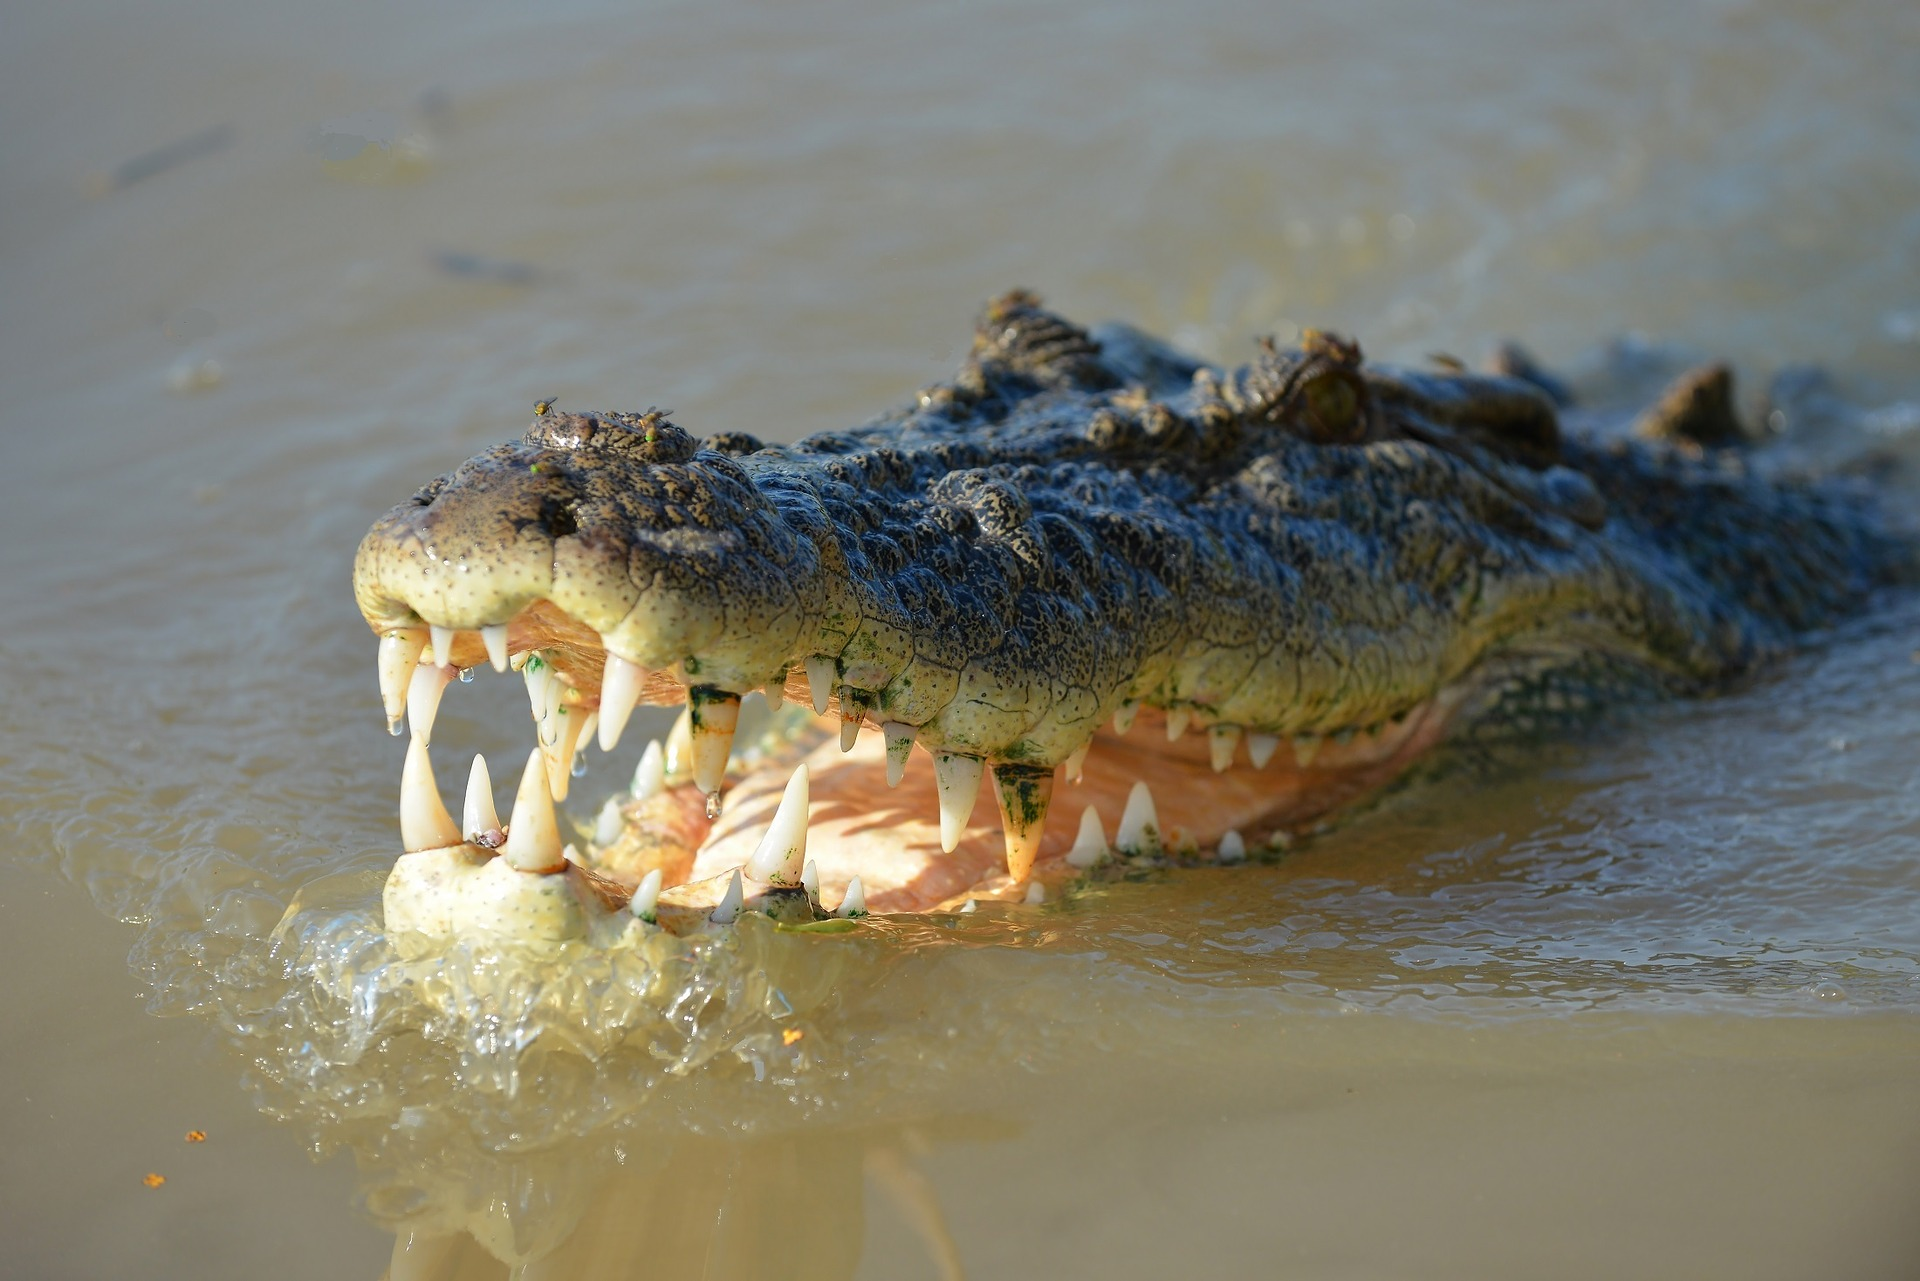 crocodile-1402089_1920.jpg